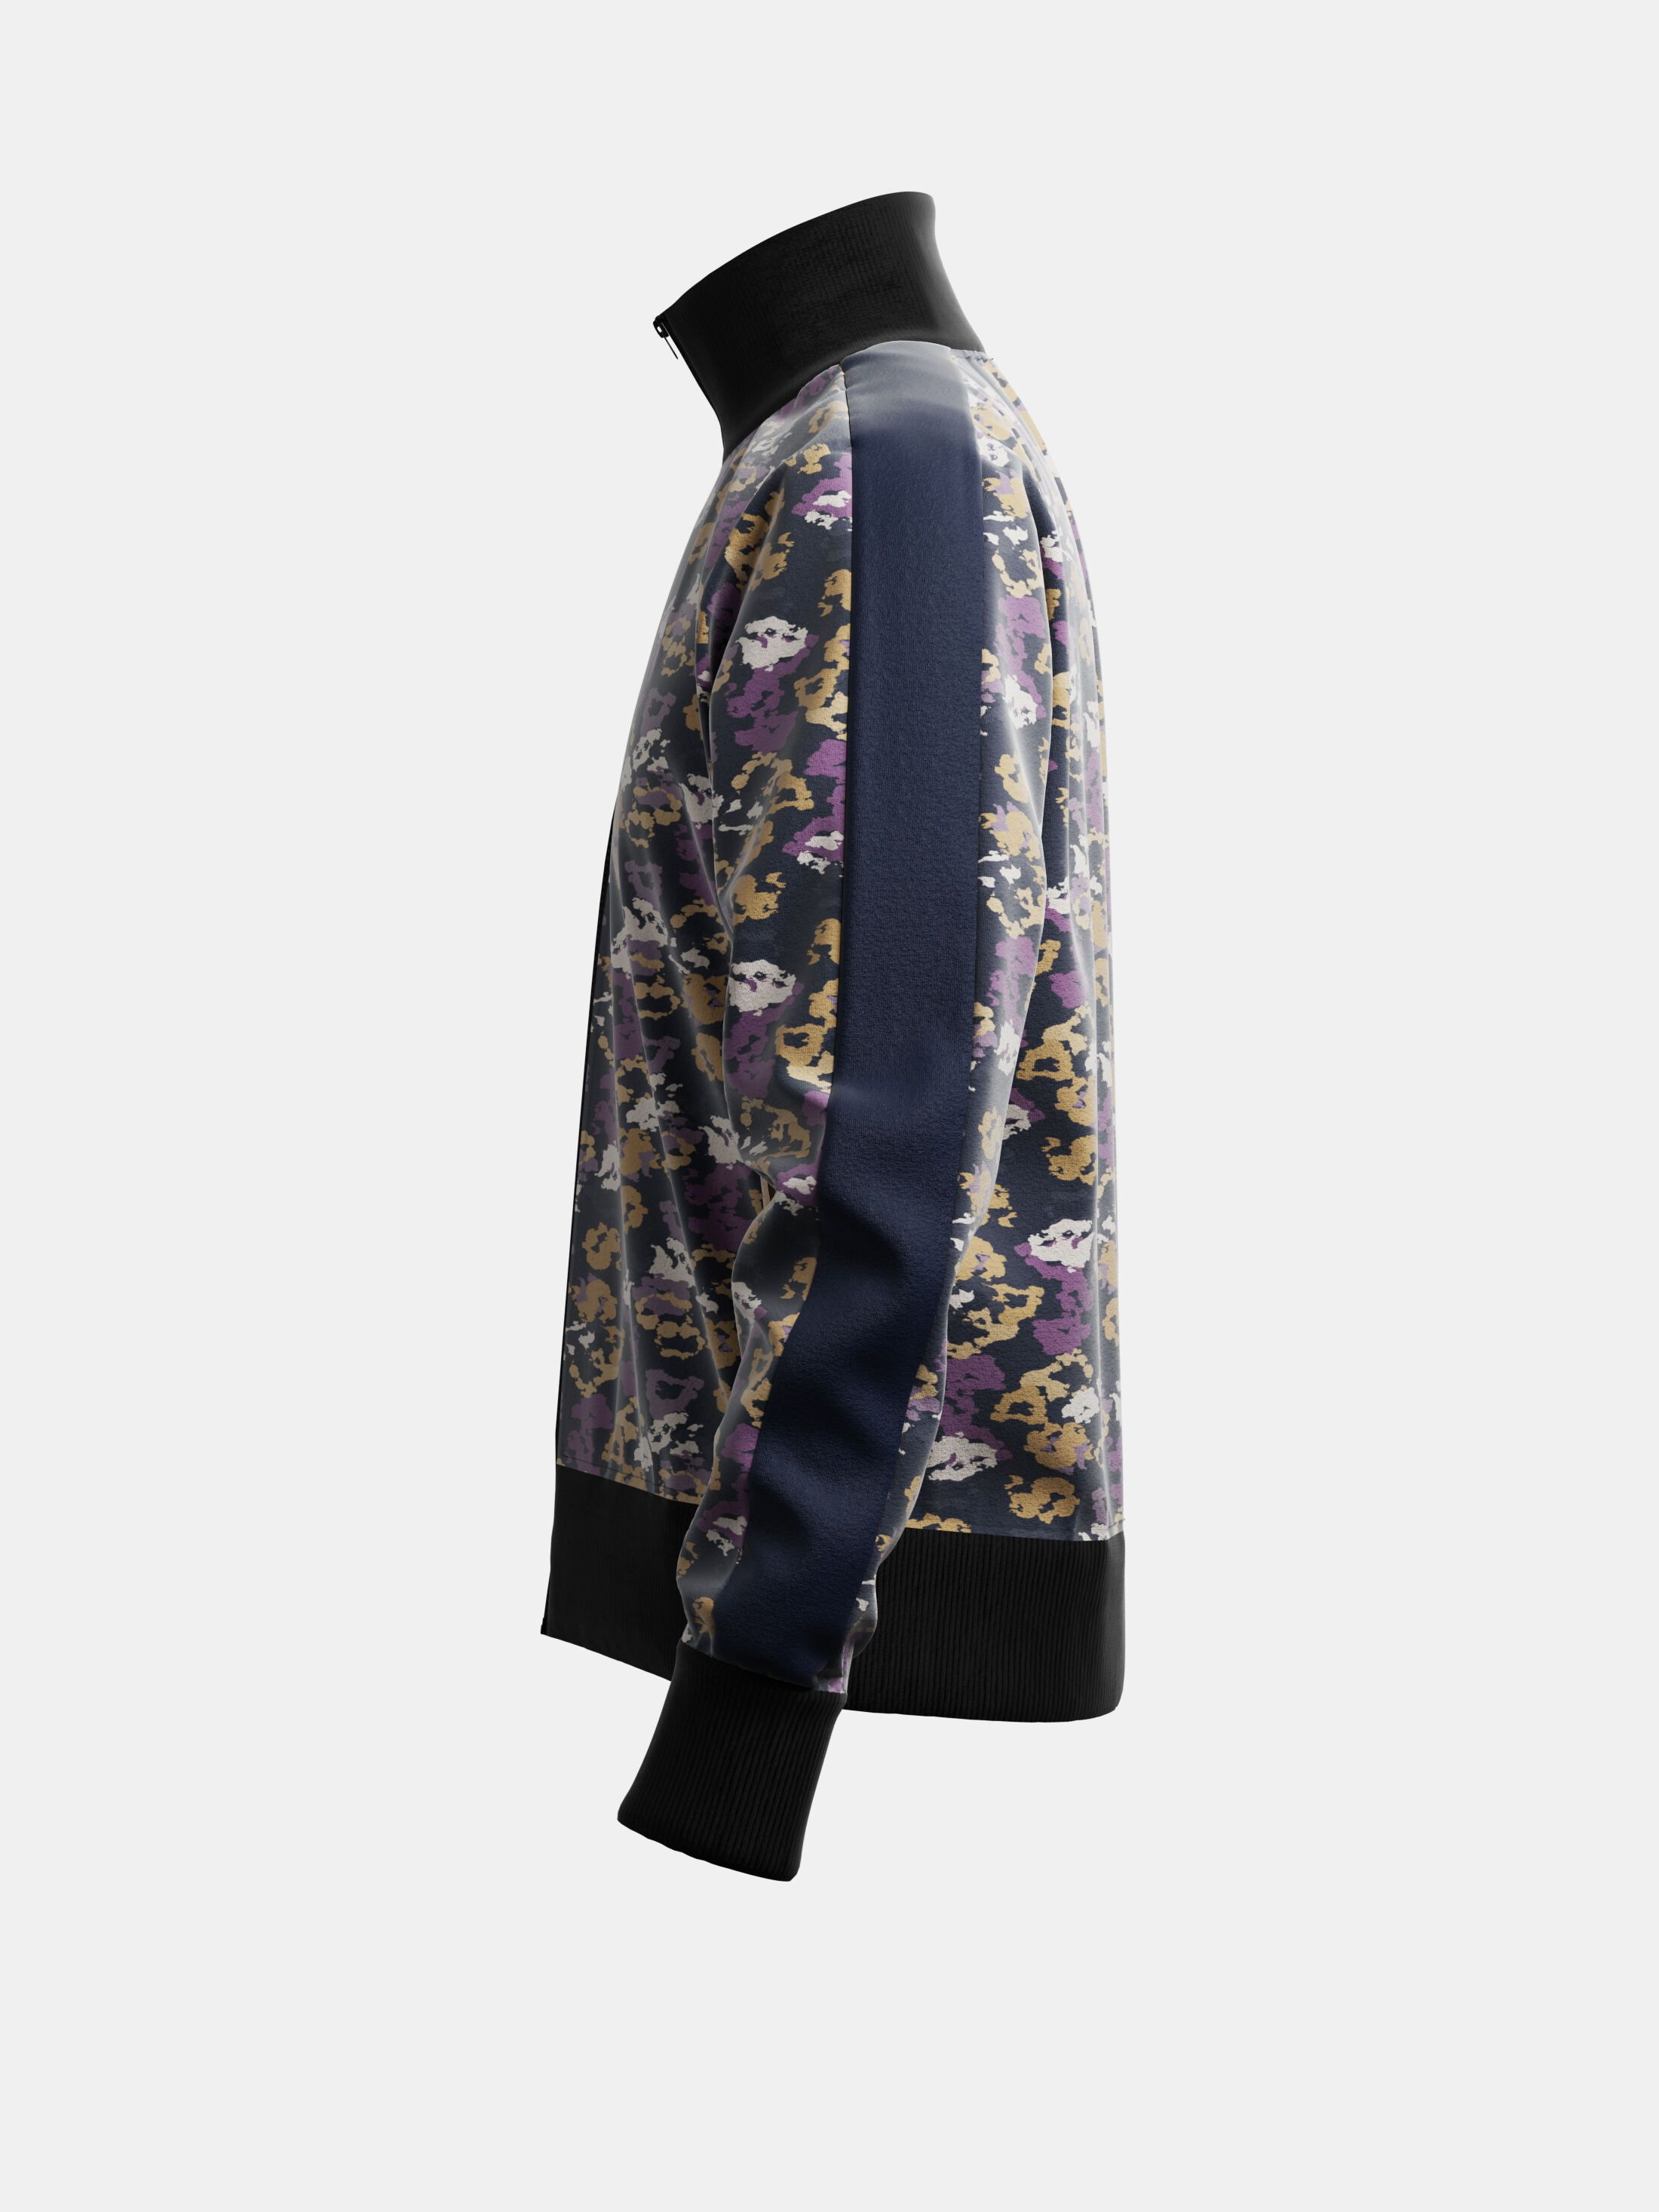 Custom Jogging Jacket & Pants side